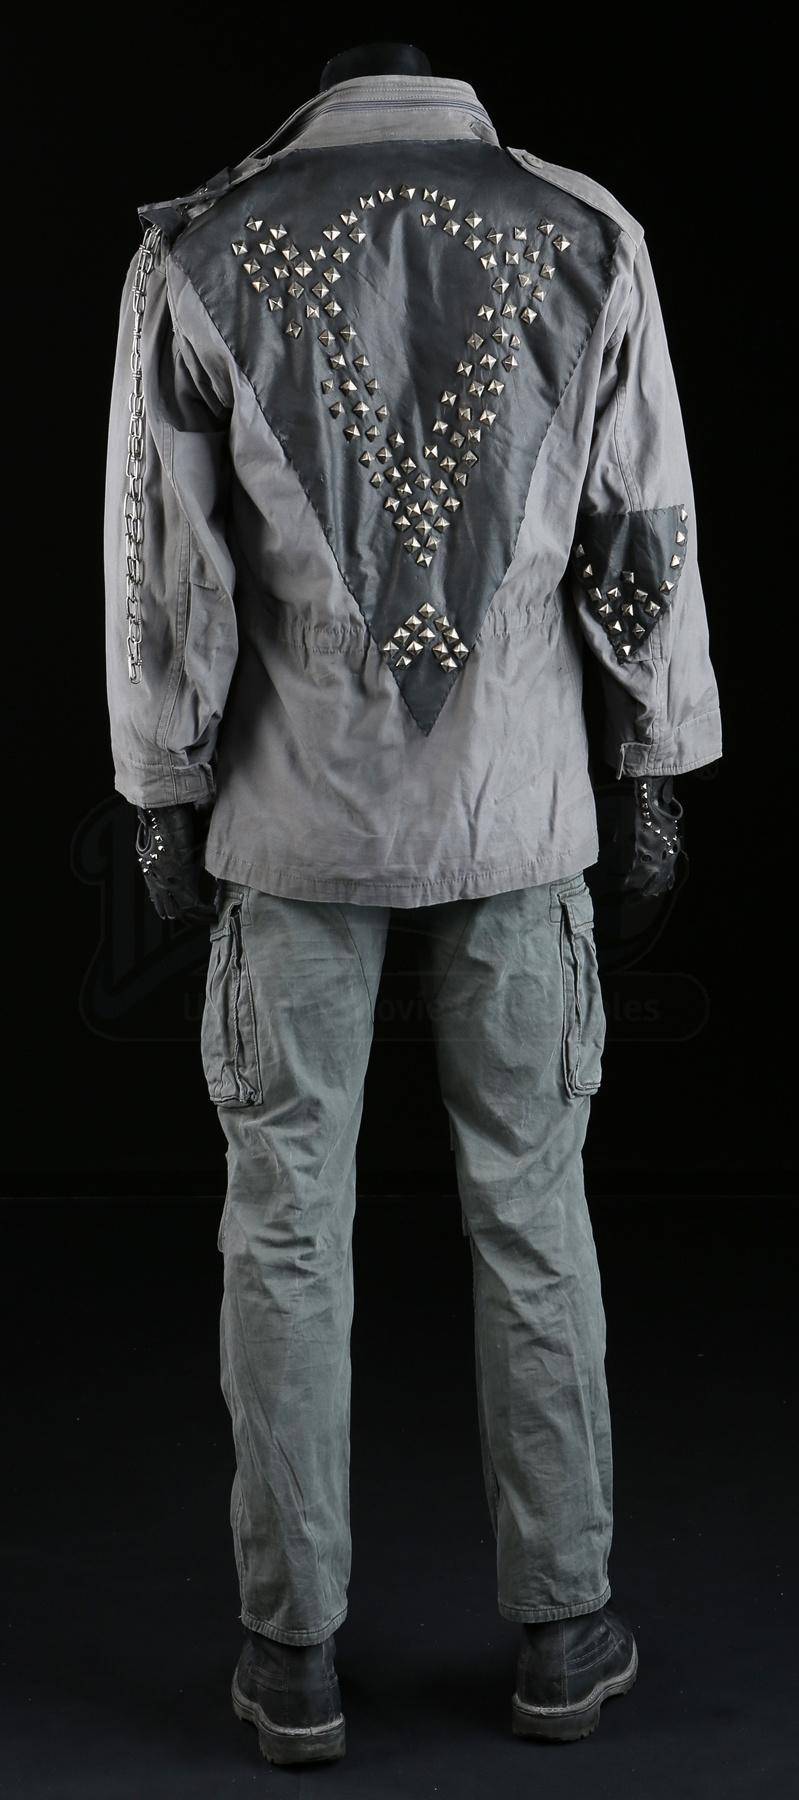 Pre-Sell Terminator Movie Licensed T-Shirt #1